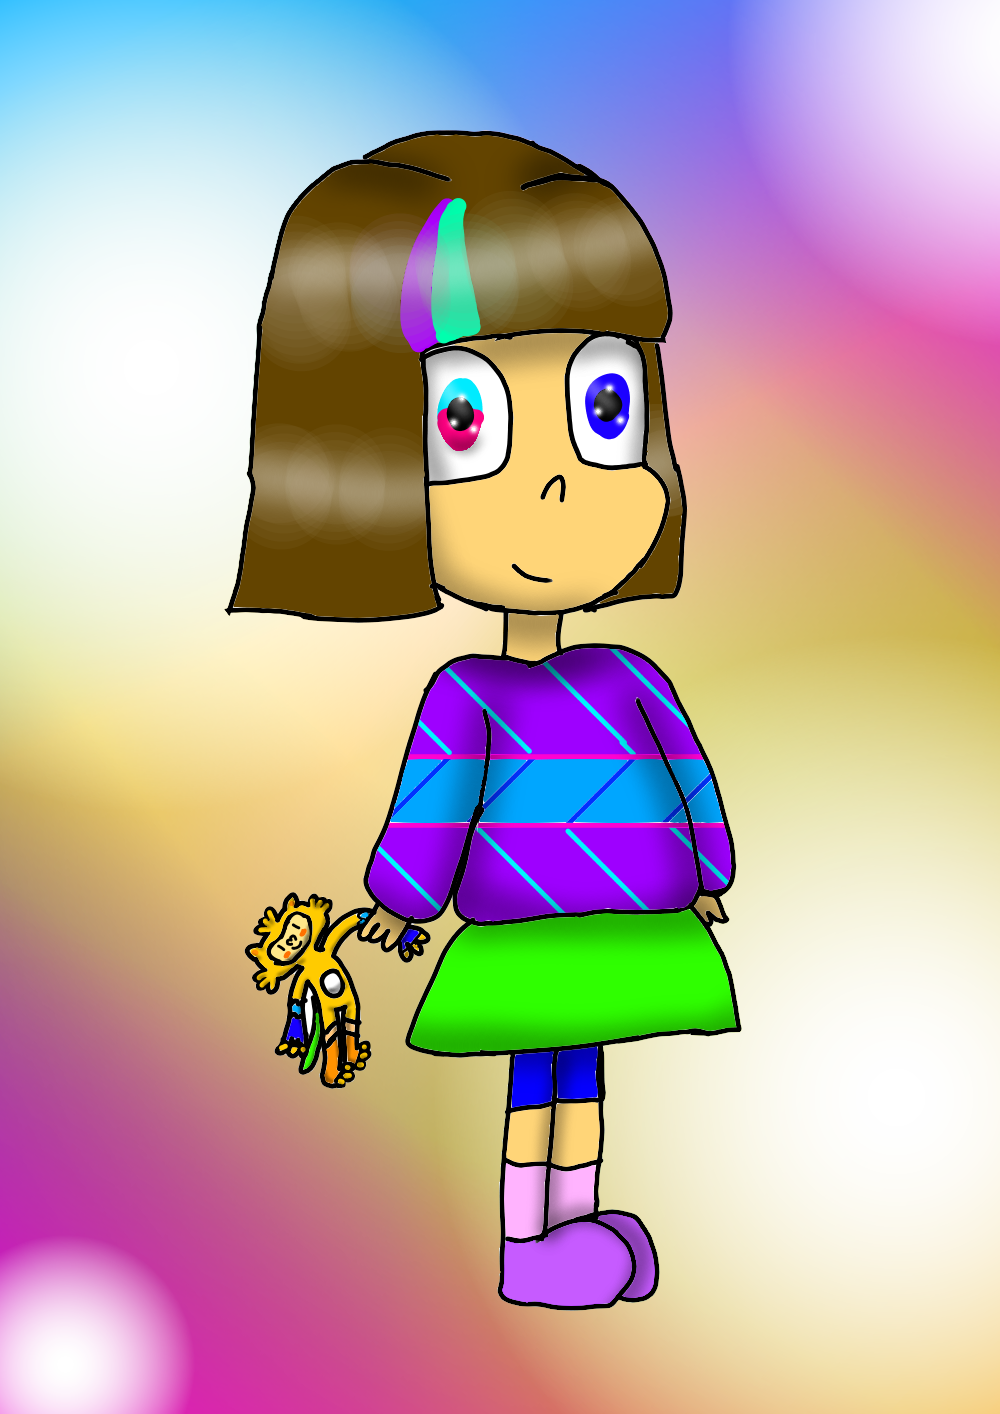 Mascot!Frisk #6 by YuliaRabbid